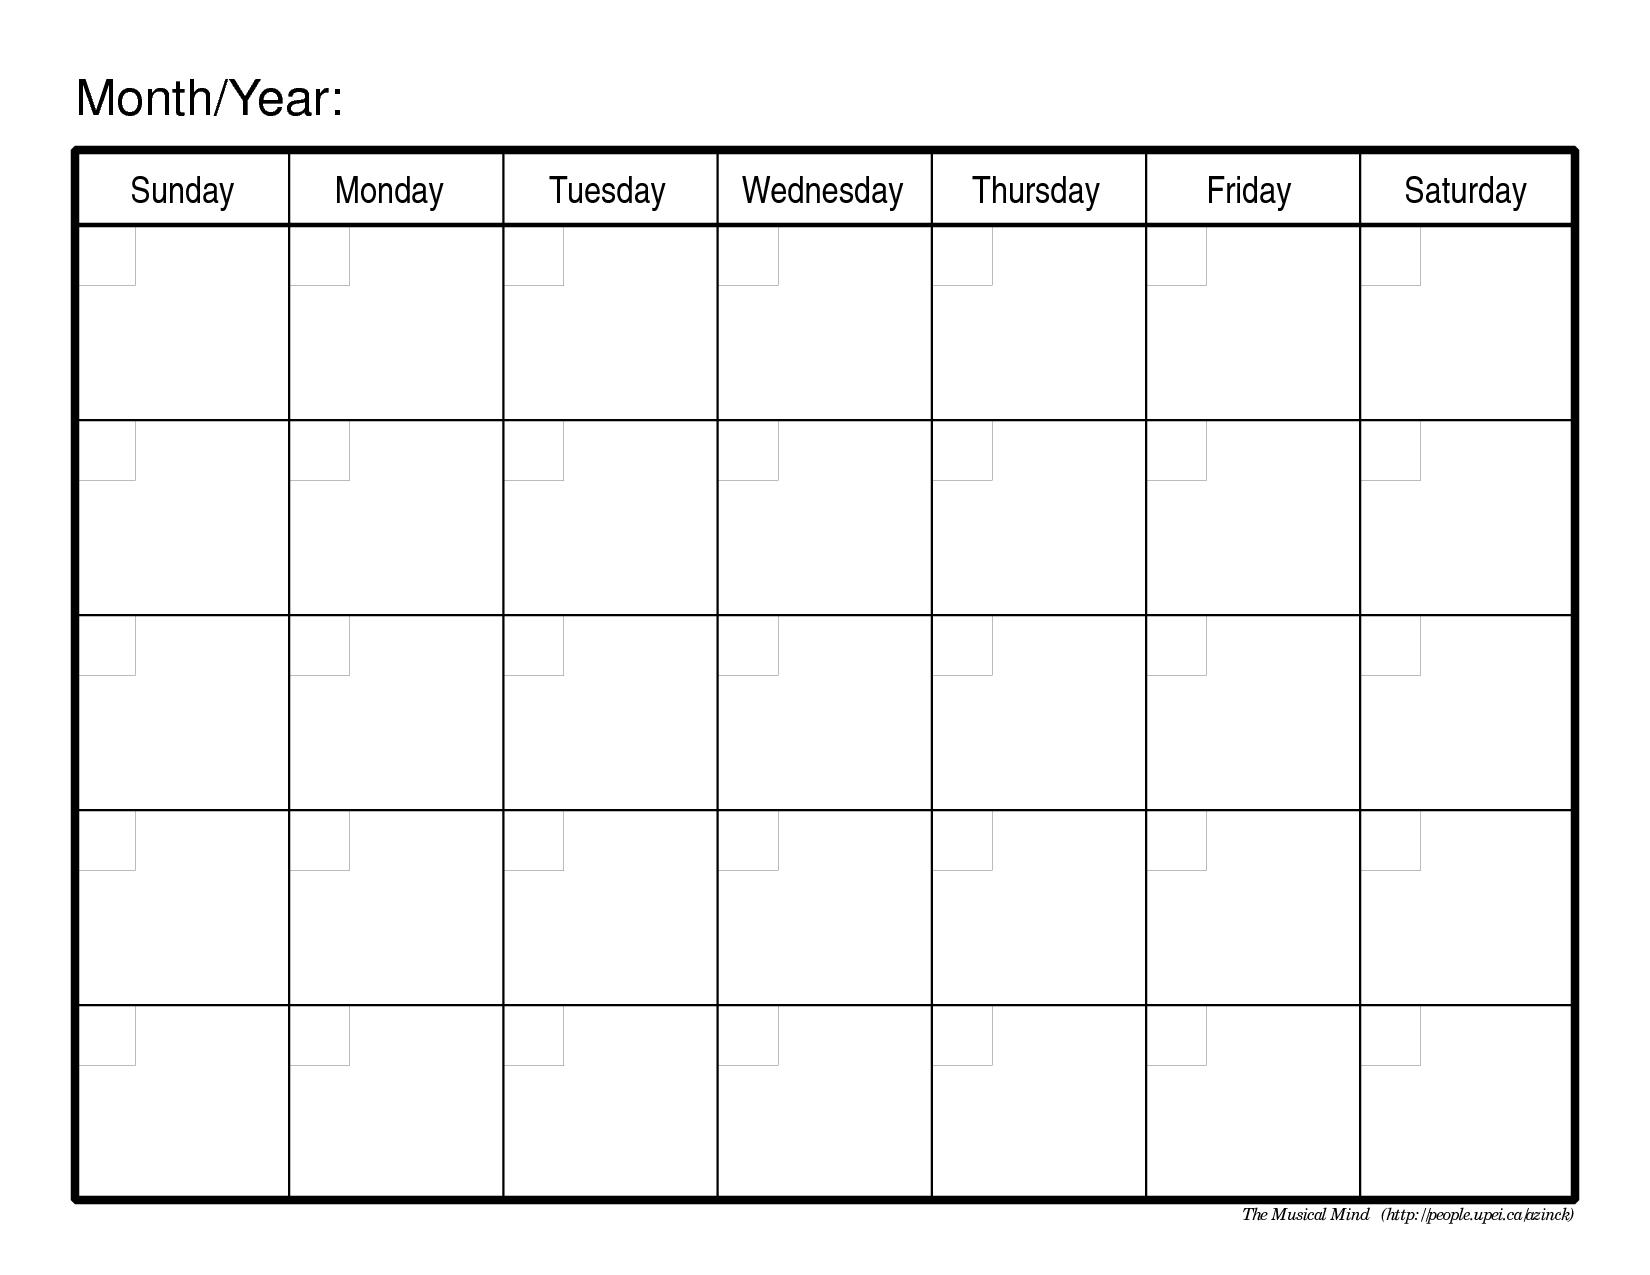 Monthly Calendar Template | Organizing | Blank Monthly Calendar  Blank Monthly Calendars To Print